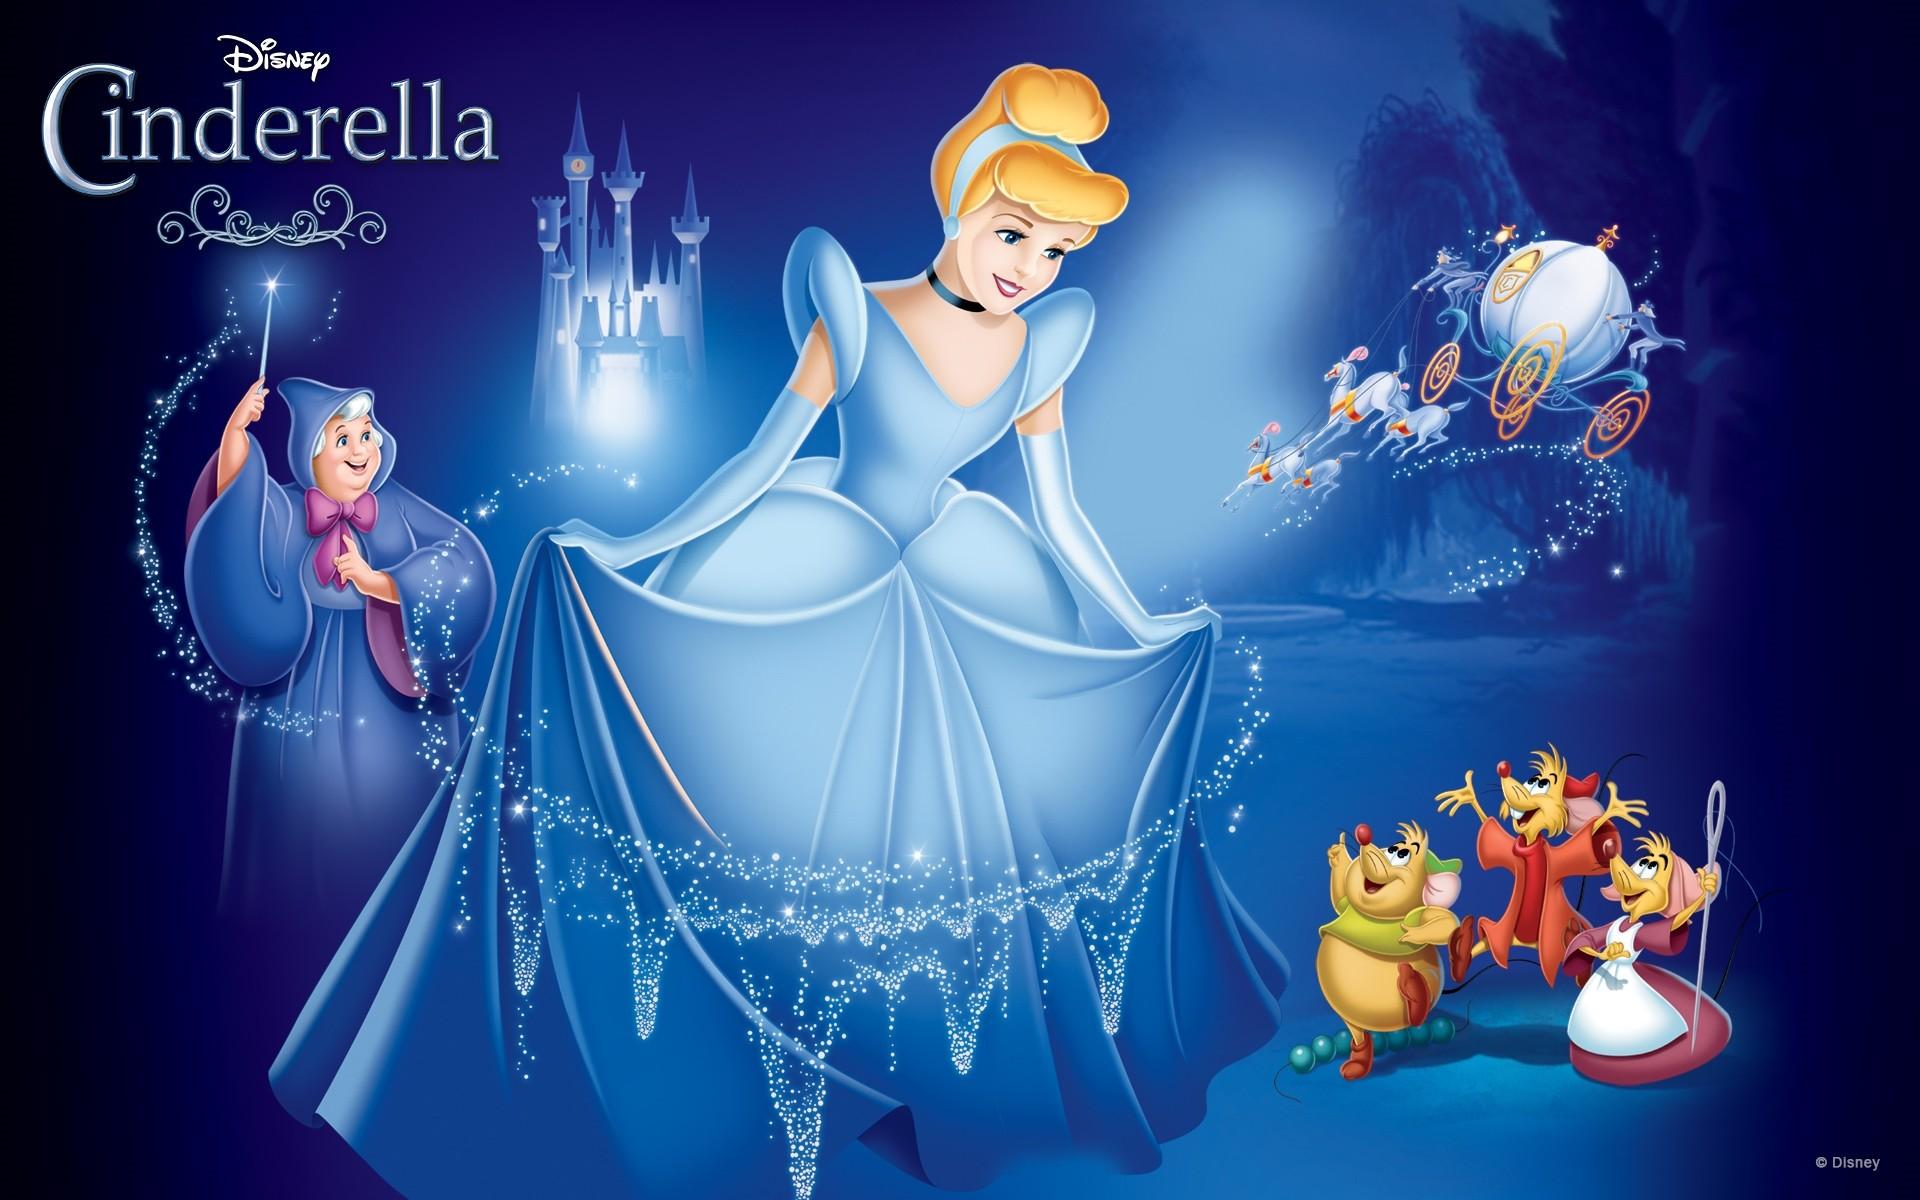 Disney Desktop Wallpaper Hd: Walt Disney Desktop Wallpaper ·① WallpaperTag